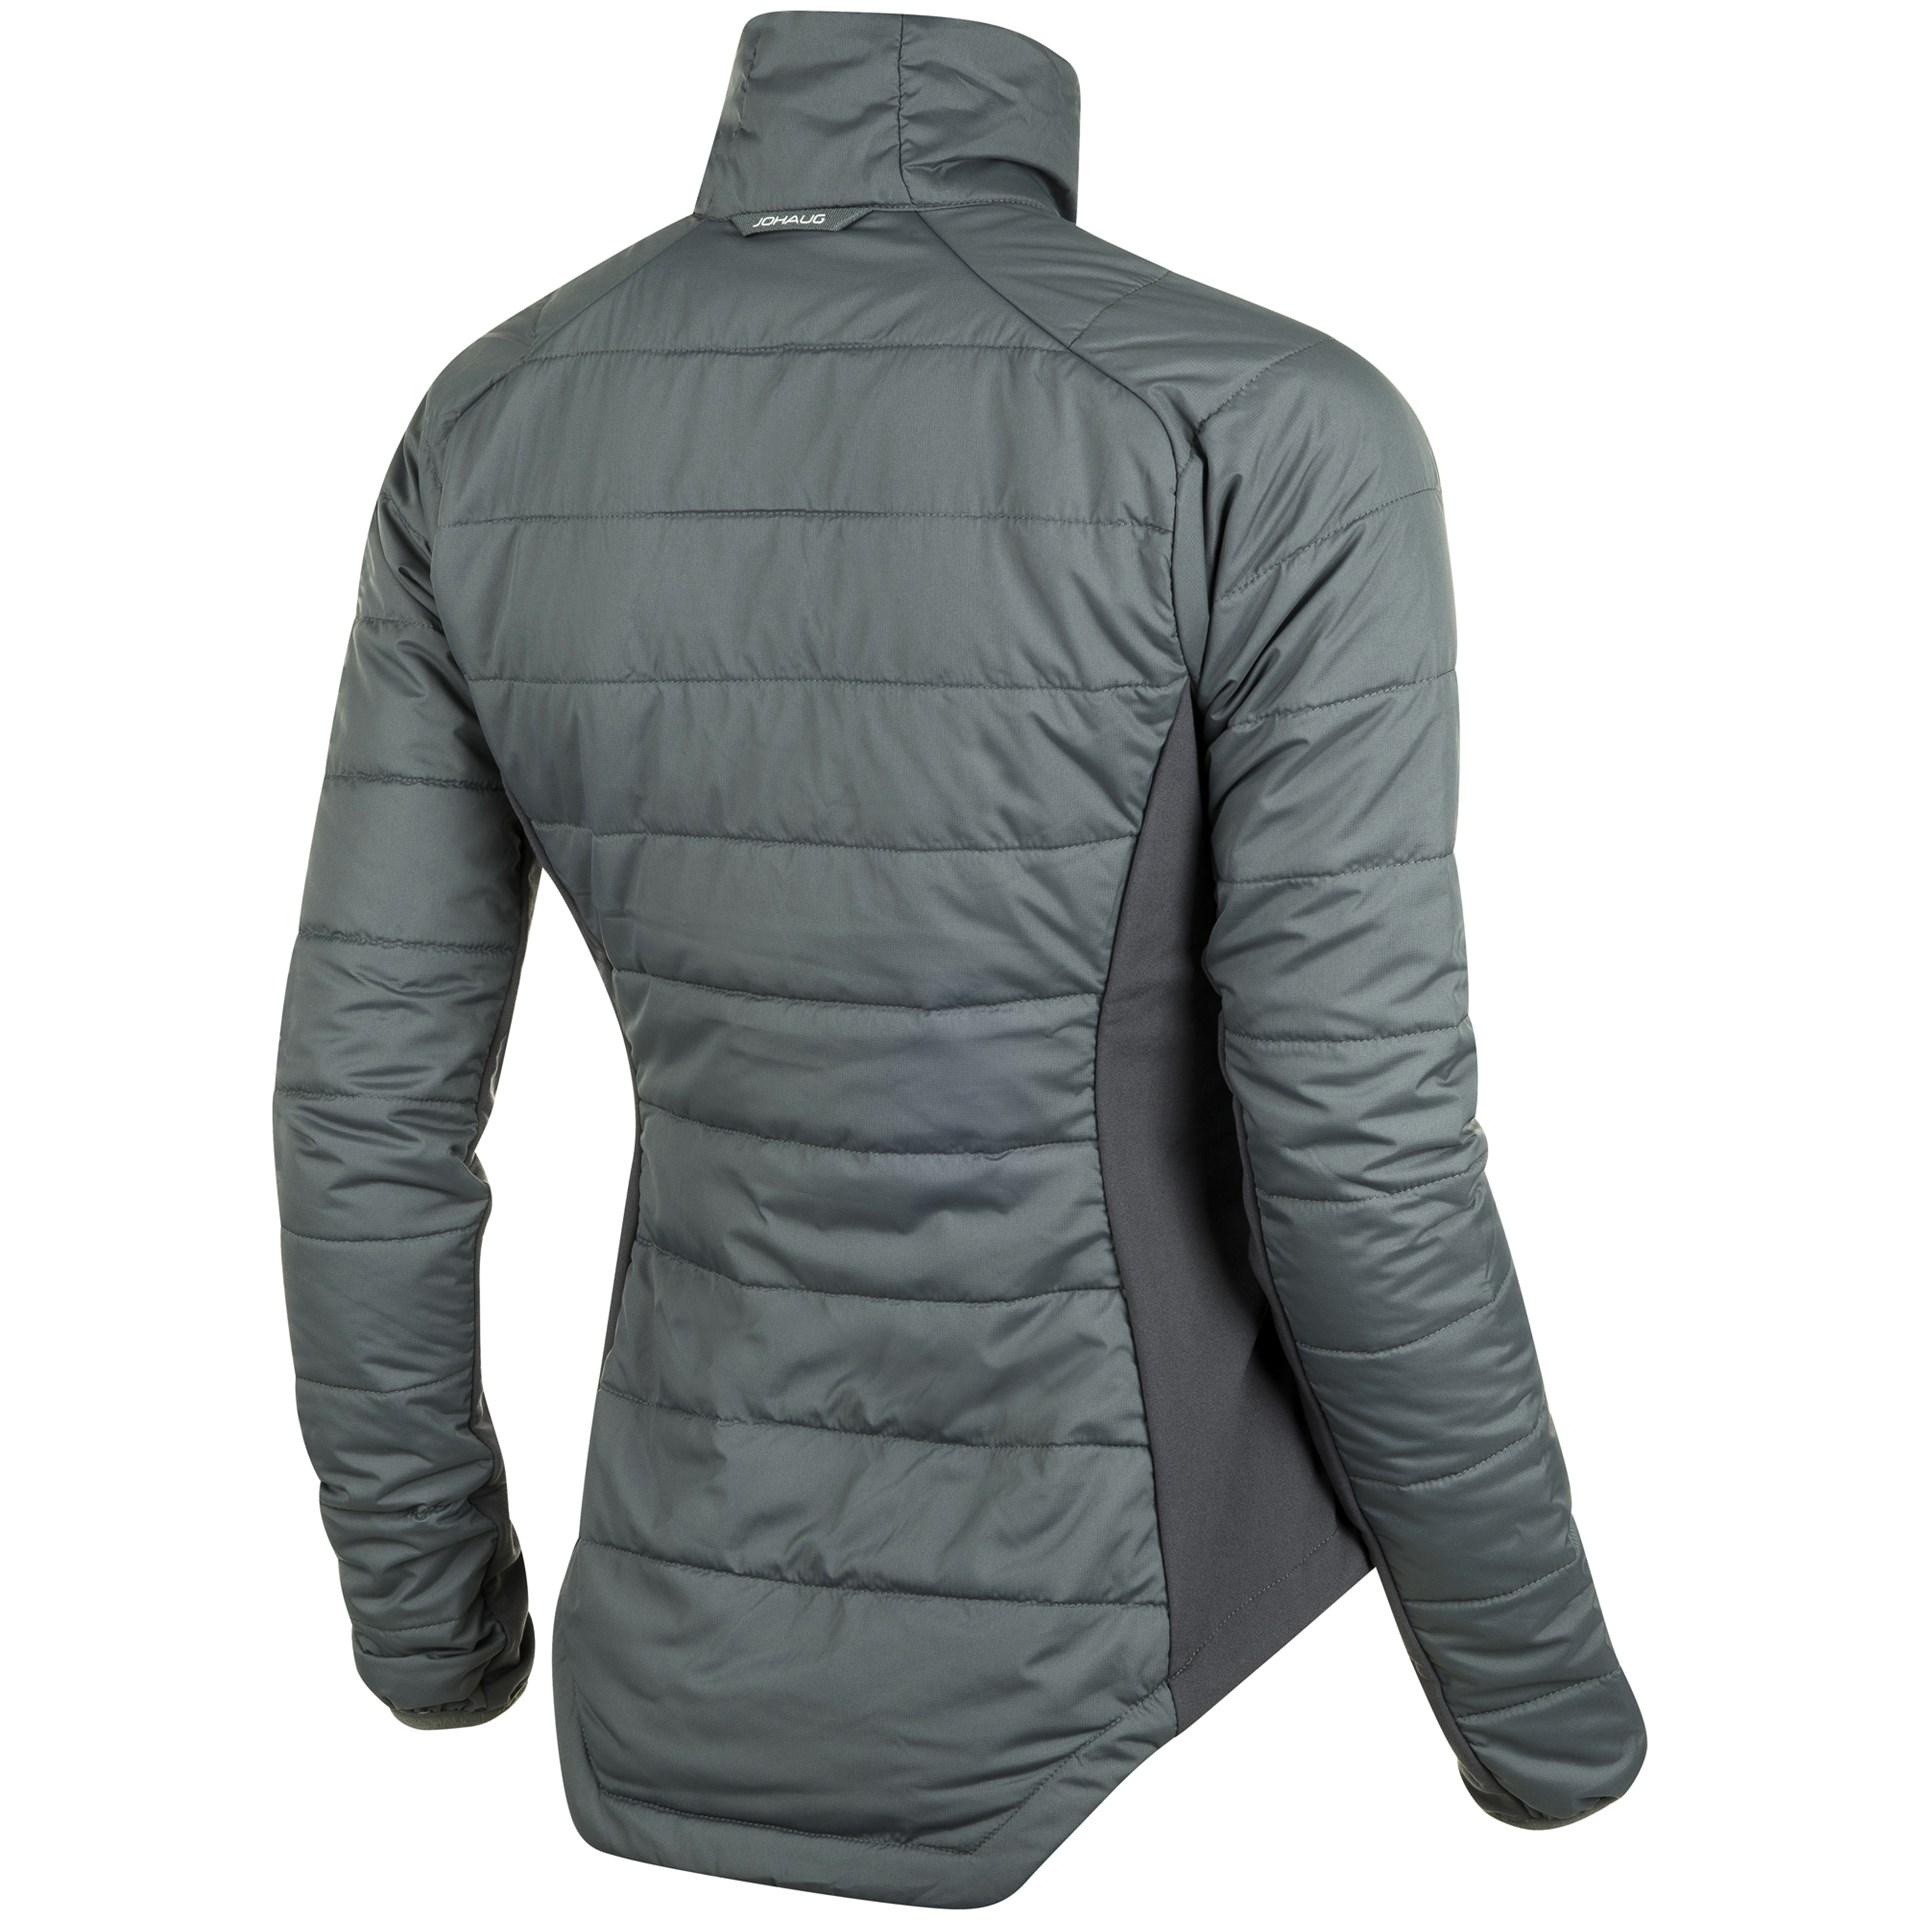 6b2bbf6f ... Bilde: Johaug Lofty Primaloft Jacket, isolasjonsjakke dame - Shadow  220344